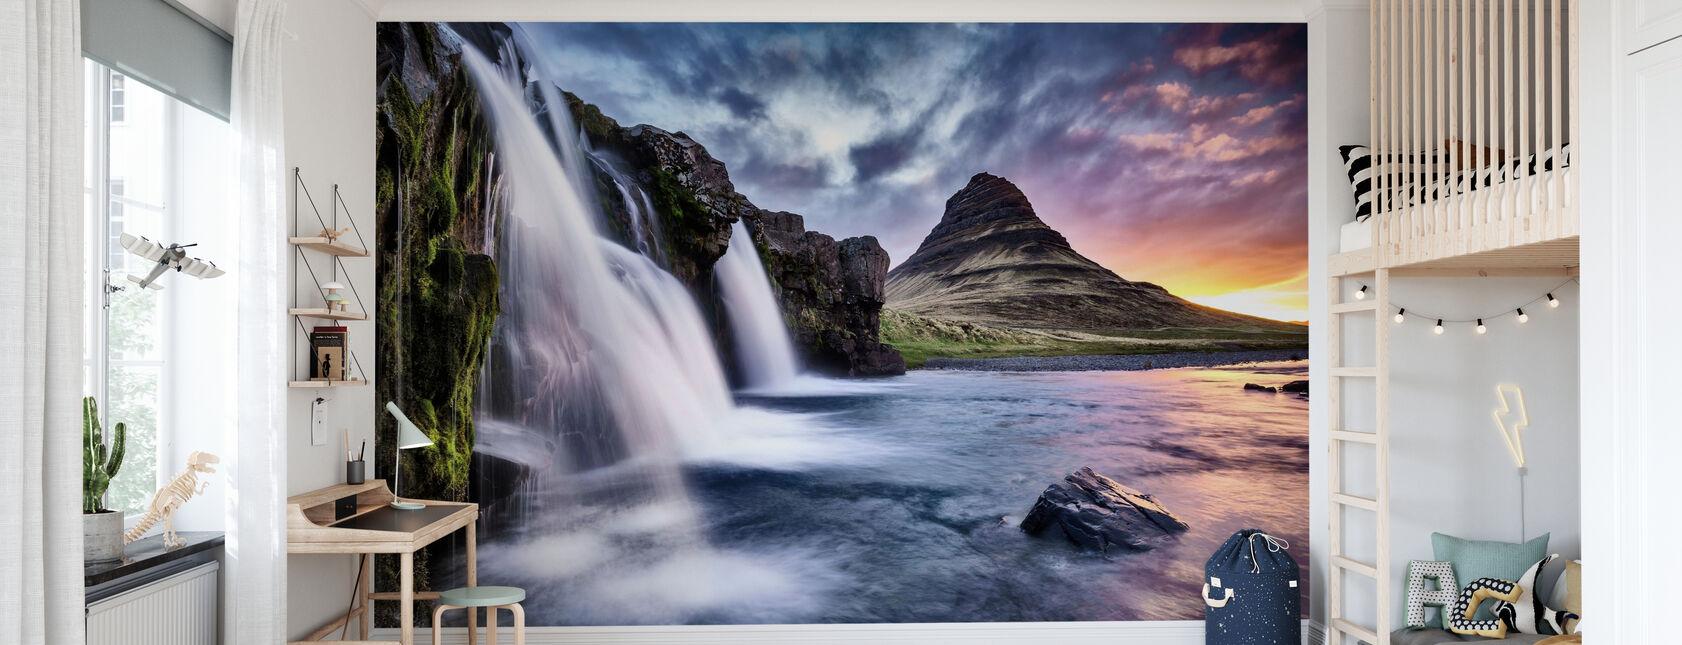 Sunset at Kirkjufellsfoss Waterfall - Wallpaper - Kids Room